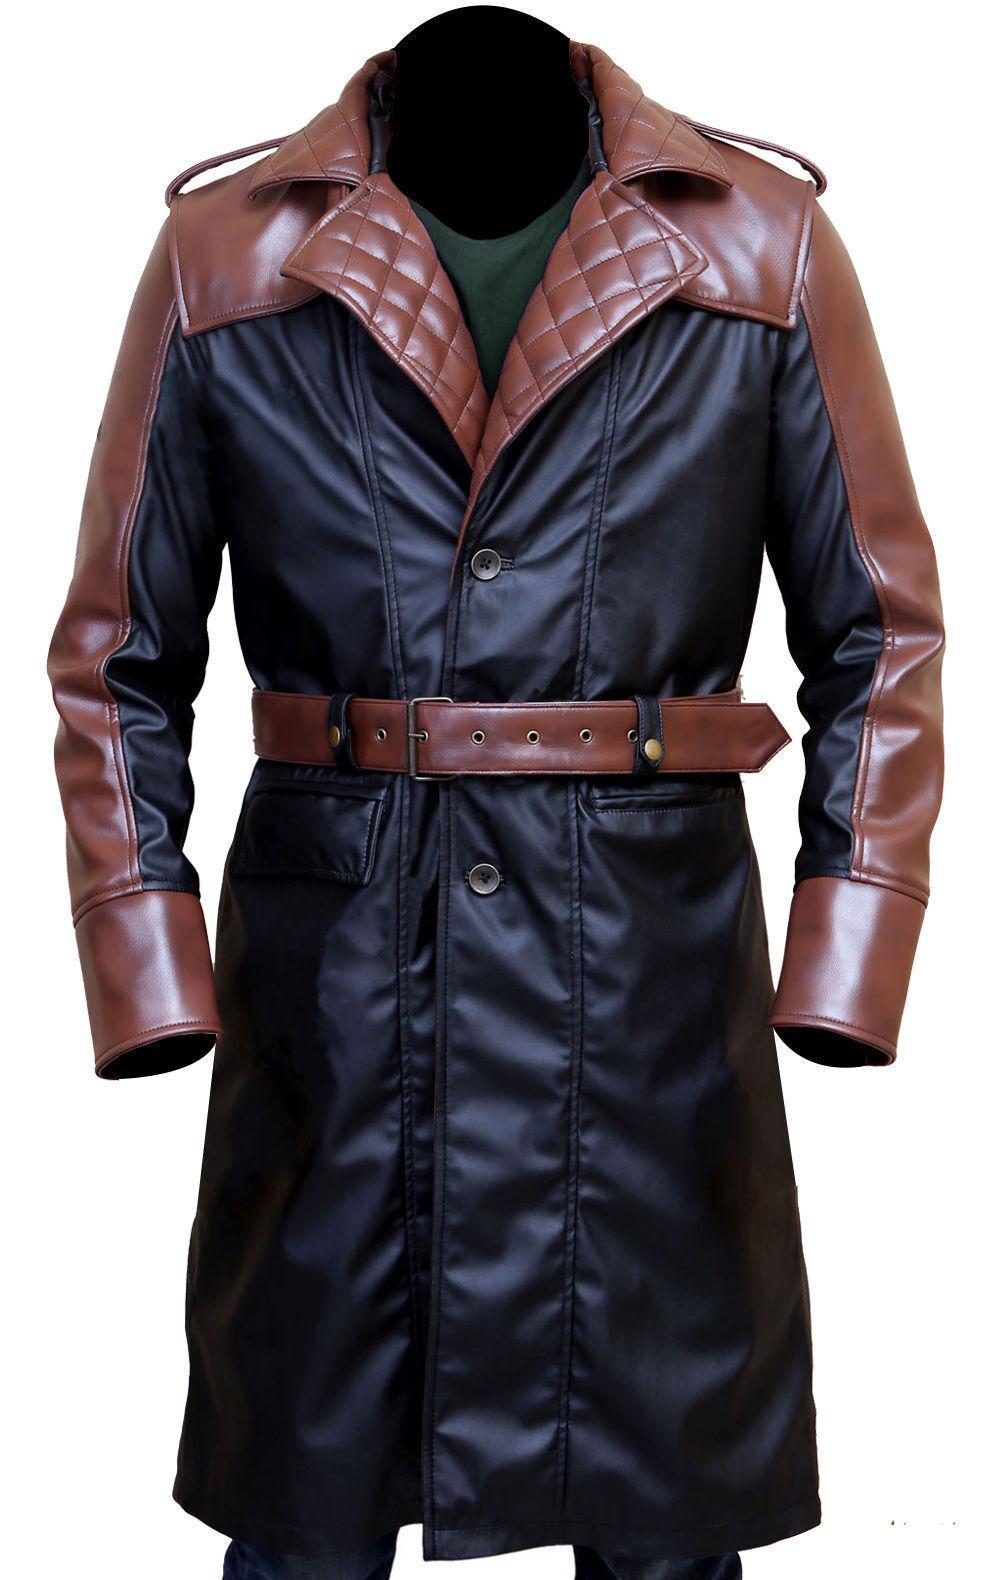 Jacob Frye Assassin's Creed Syndikat Herren Leder Trenchcoat/Kostüm